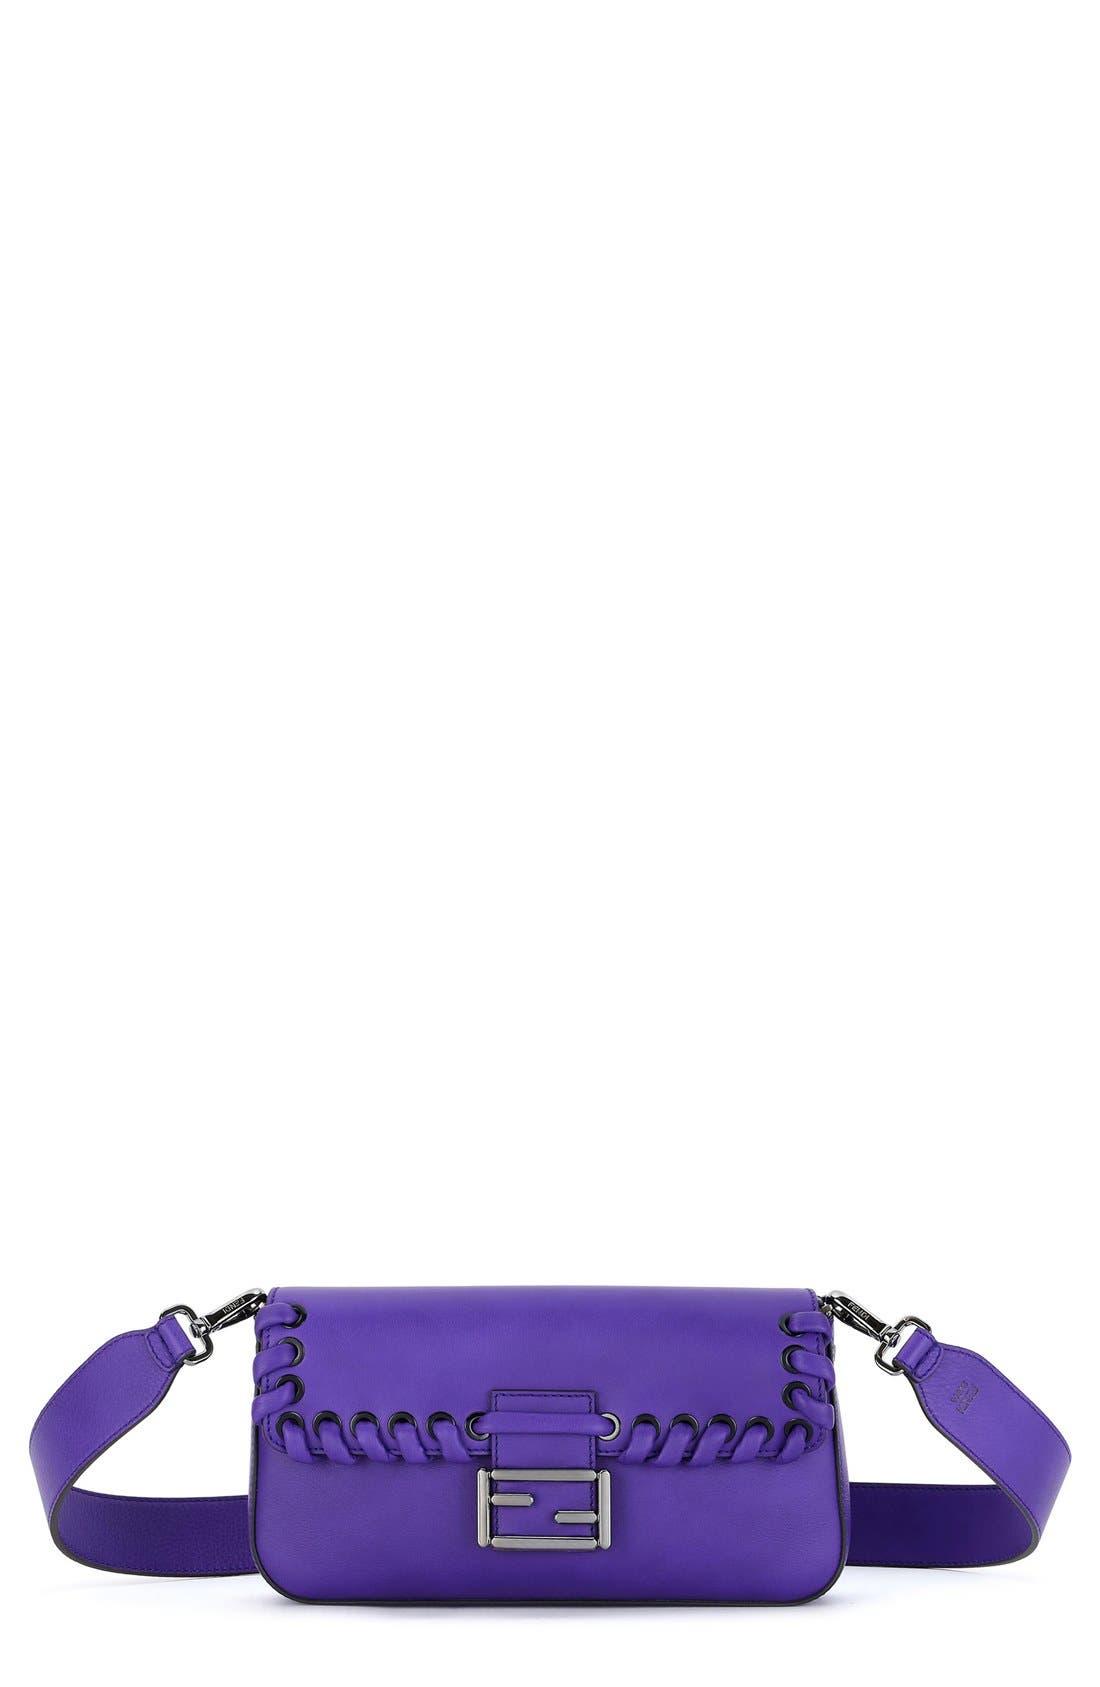 'Dolce' Calfskin Leather Baguette,                         Main,                         color,